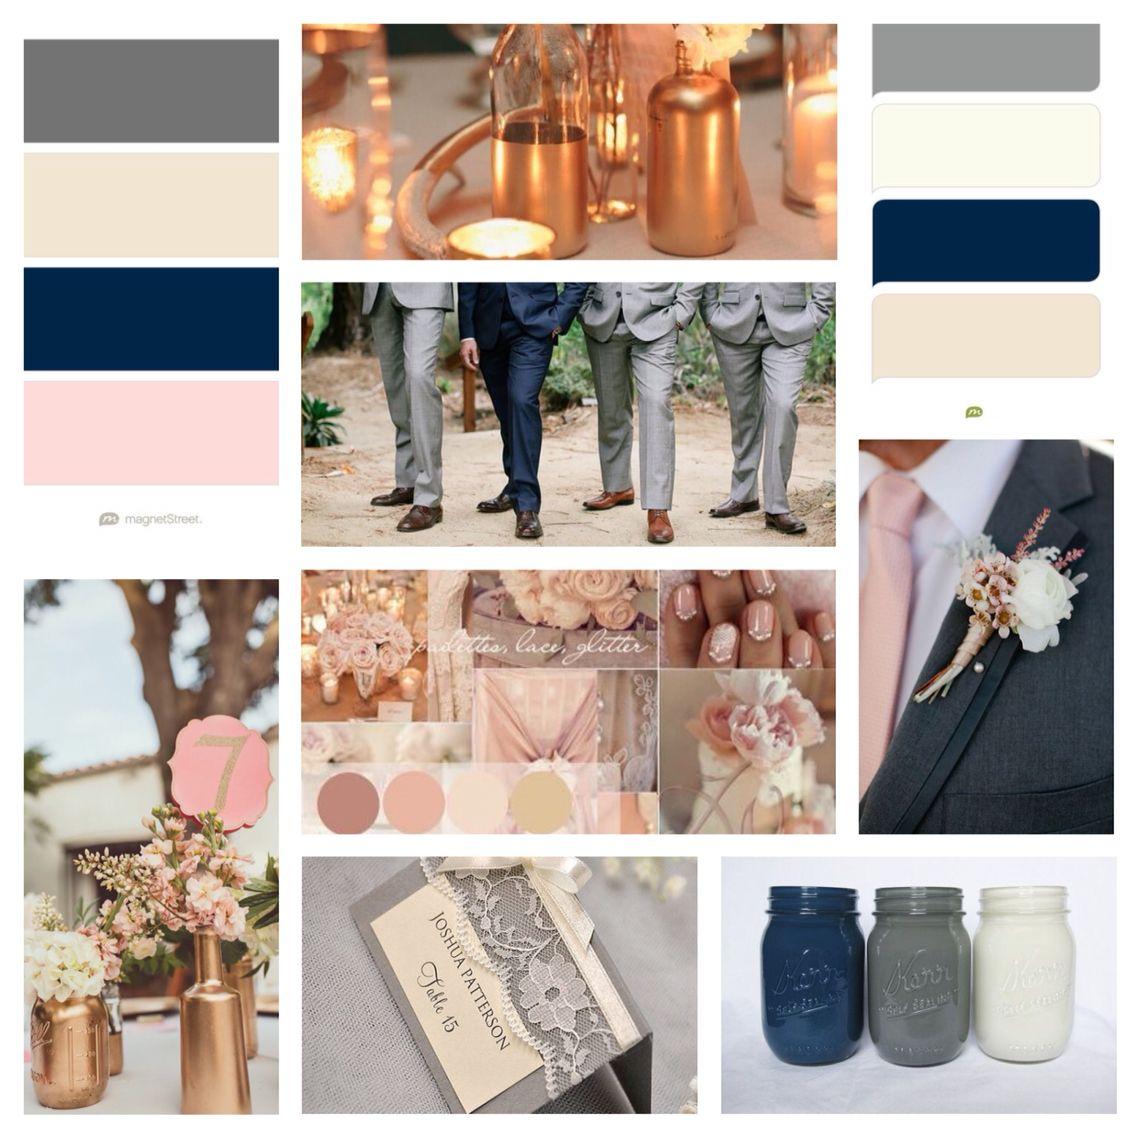 Wedding Colors Copper Rose Gold Blush Ivory Beige Grey Navy